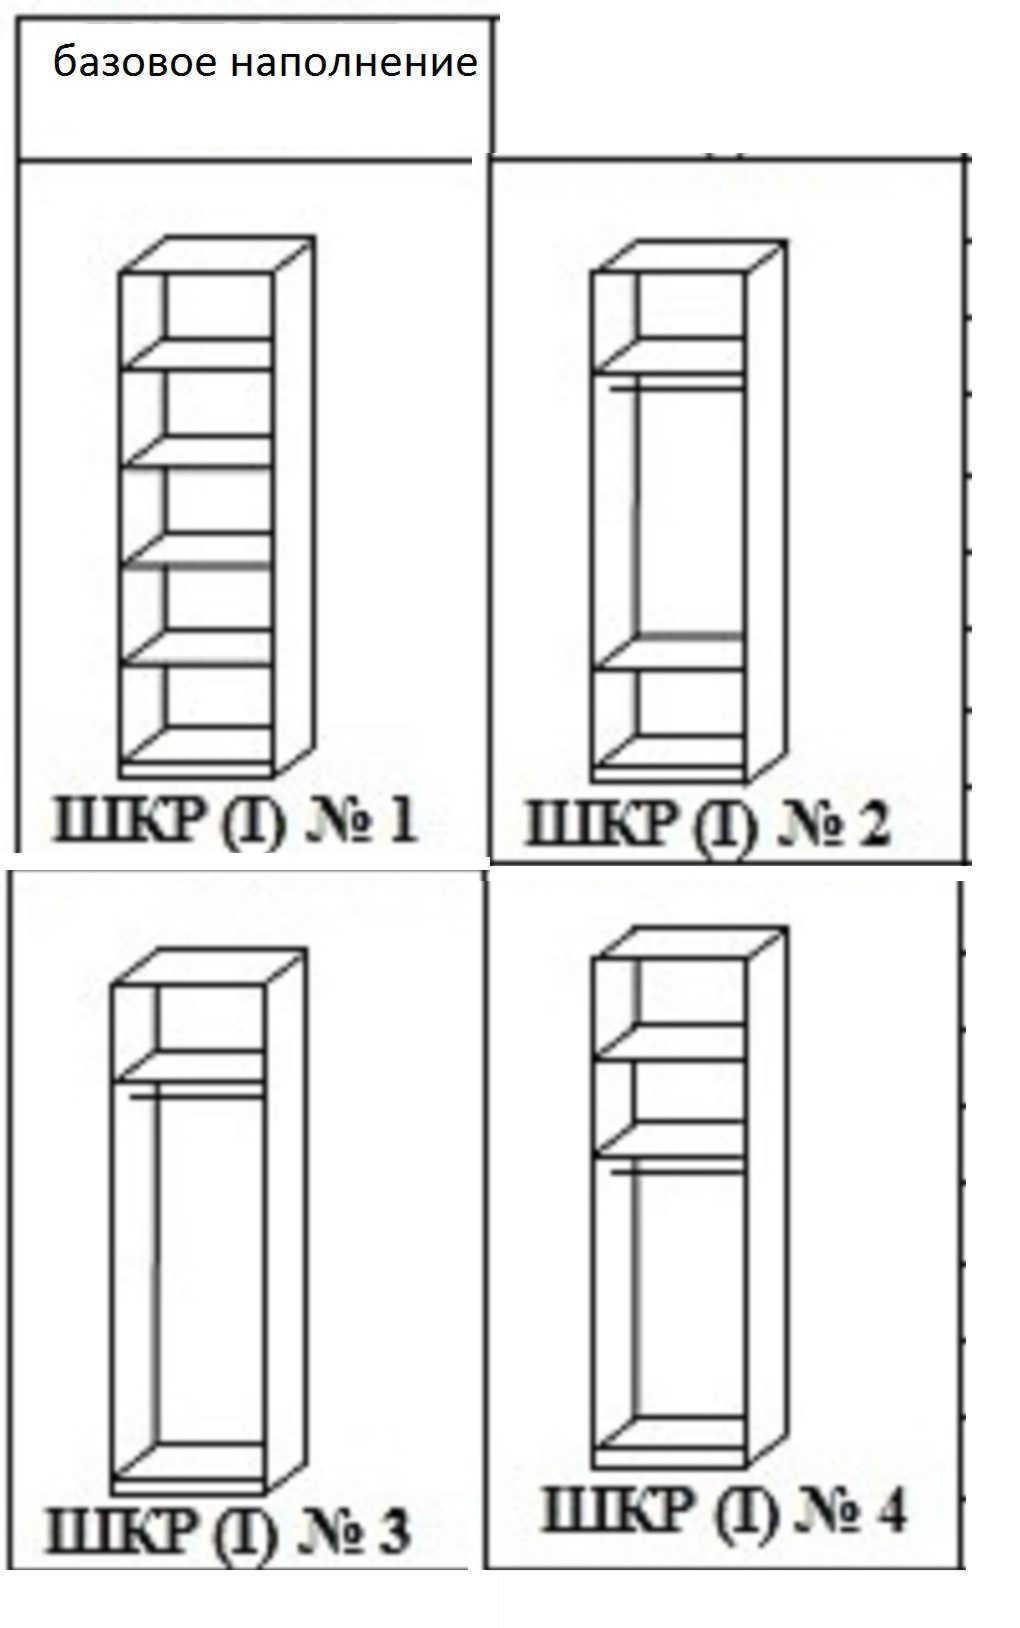 Стелла-24 разная комплектация